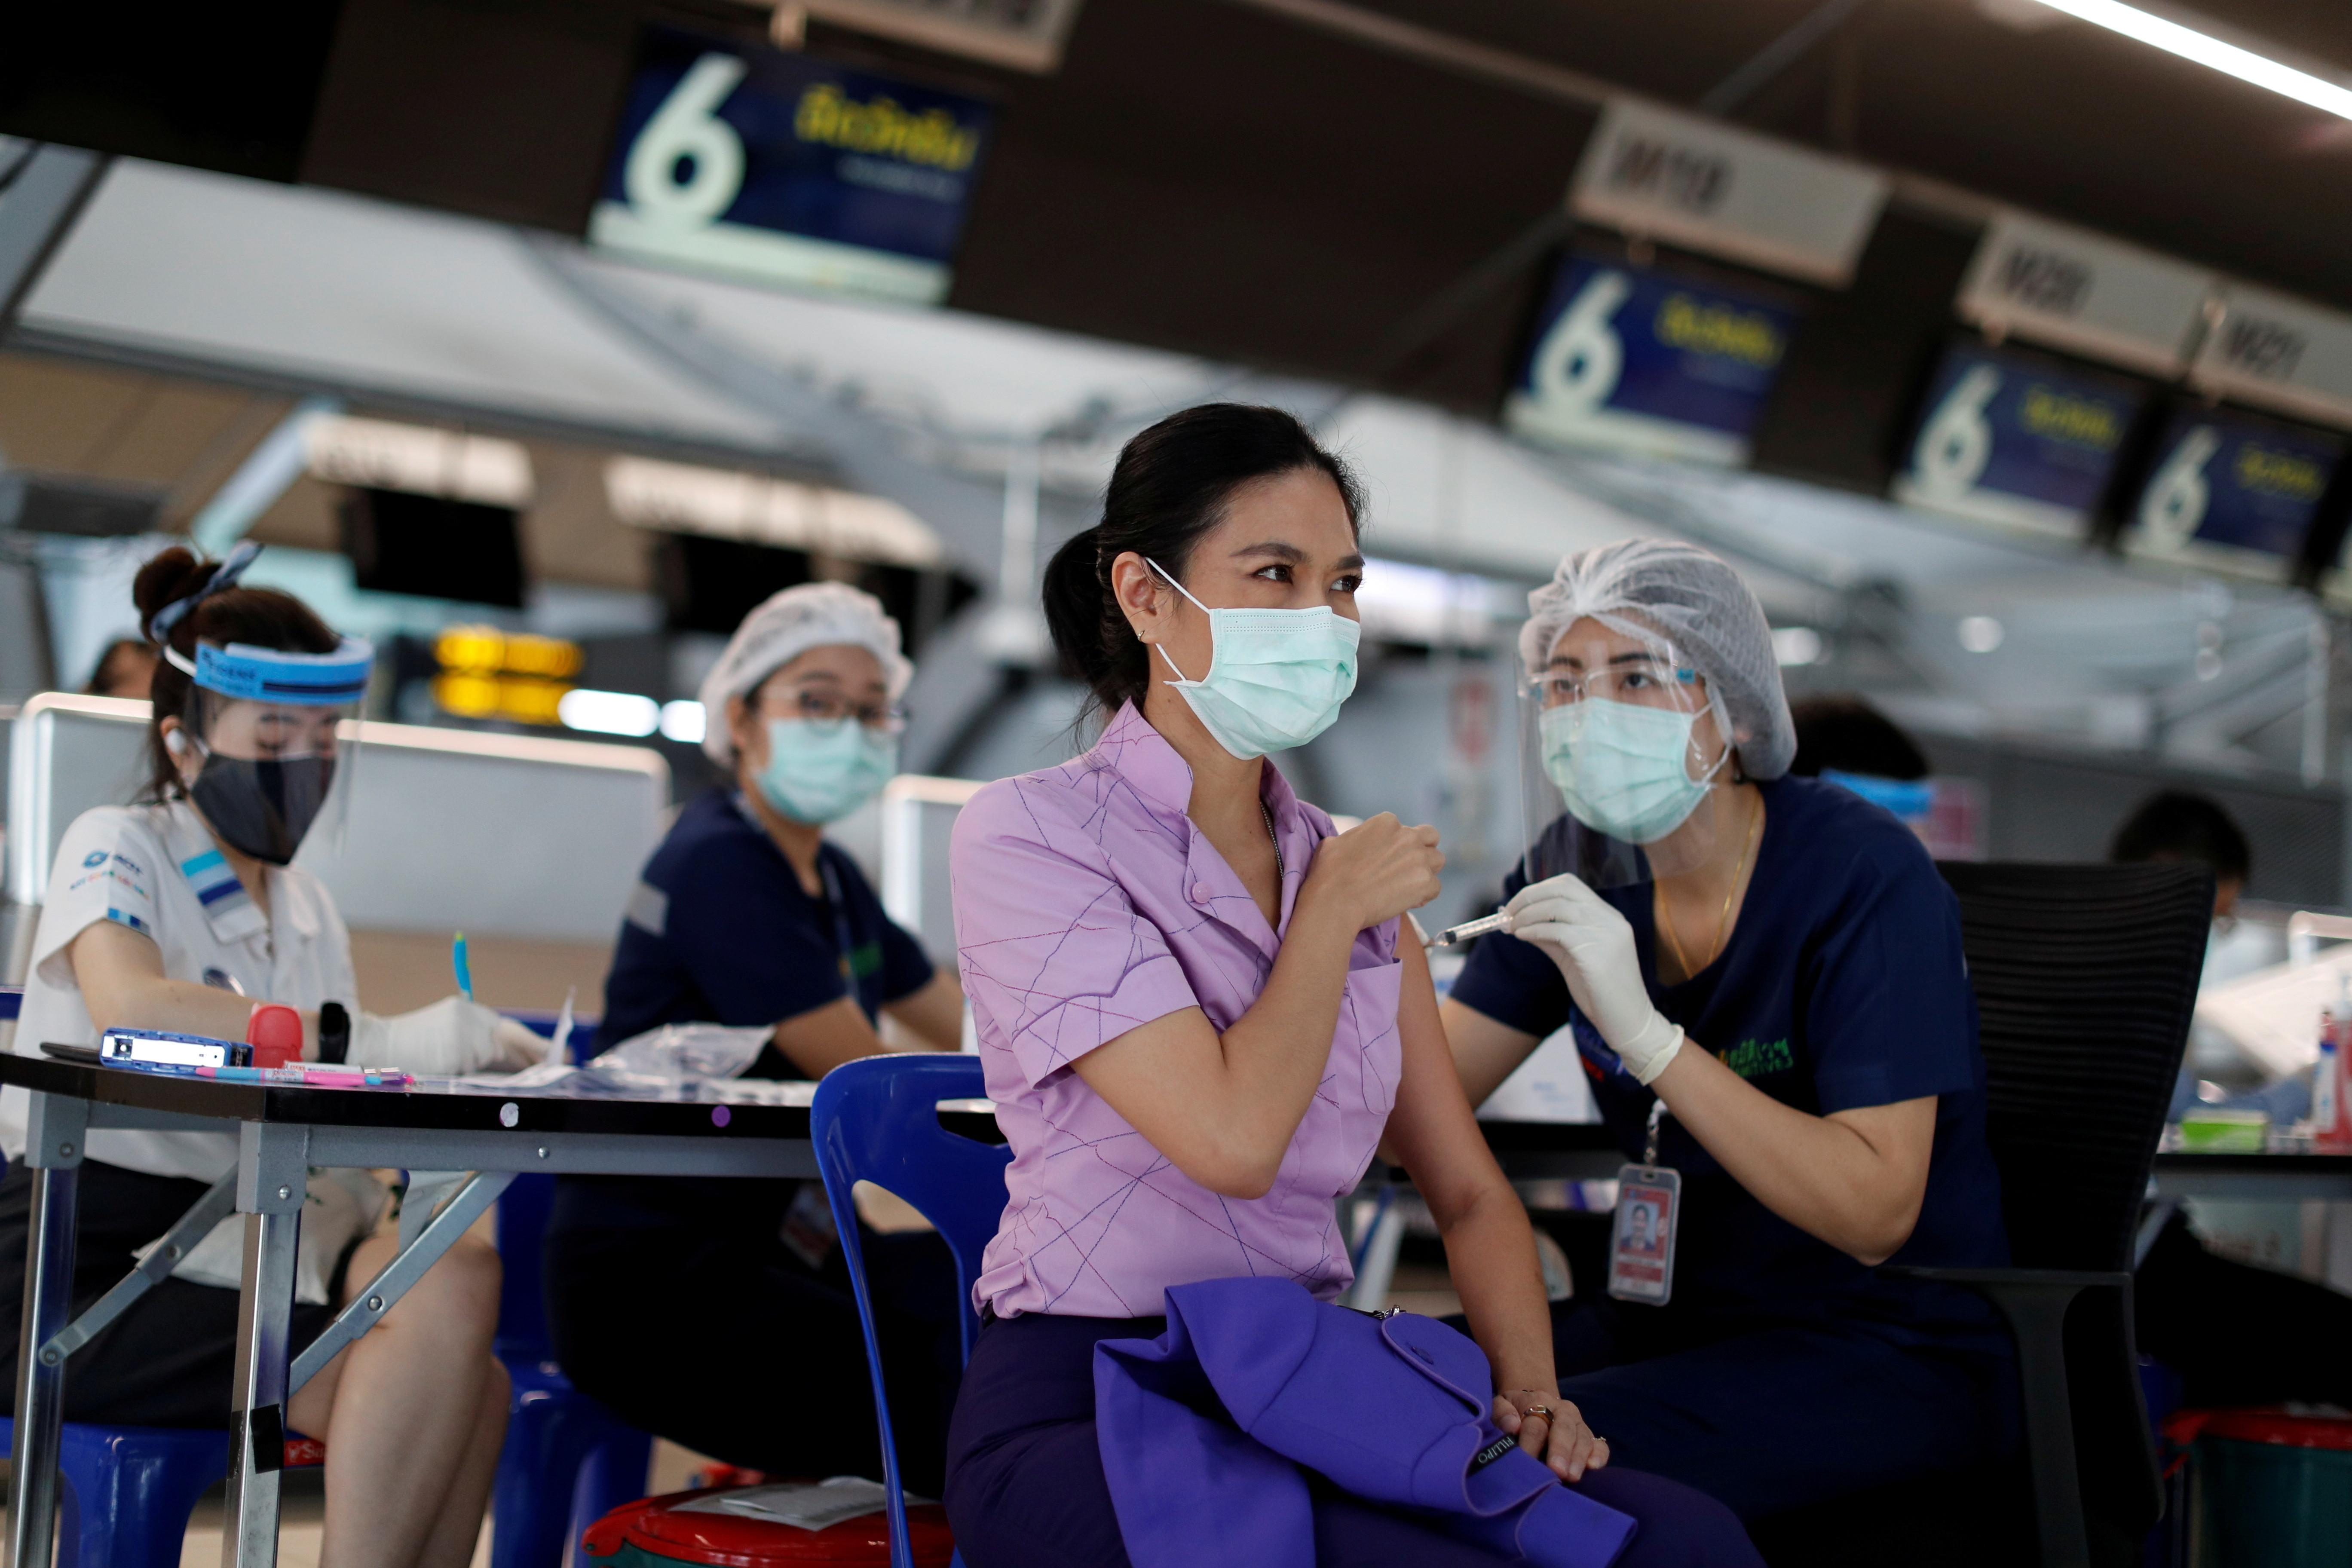 Siradhakan Chotisen, a Thai Airways crew member, receives her vaccination against the coronavirus disease (COVID-19) at Suvarnabhumi airport in Bangkok, Thailand April 28, 2021. REUTERS/Jorge Silva - RC2R4N9GSO3V